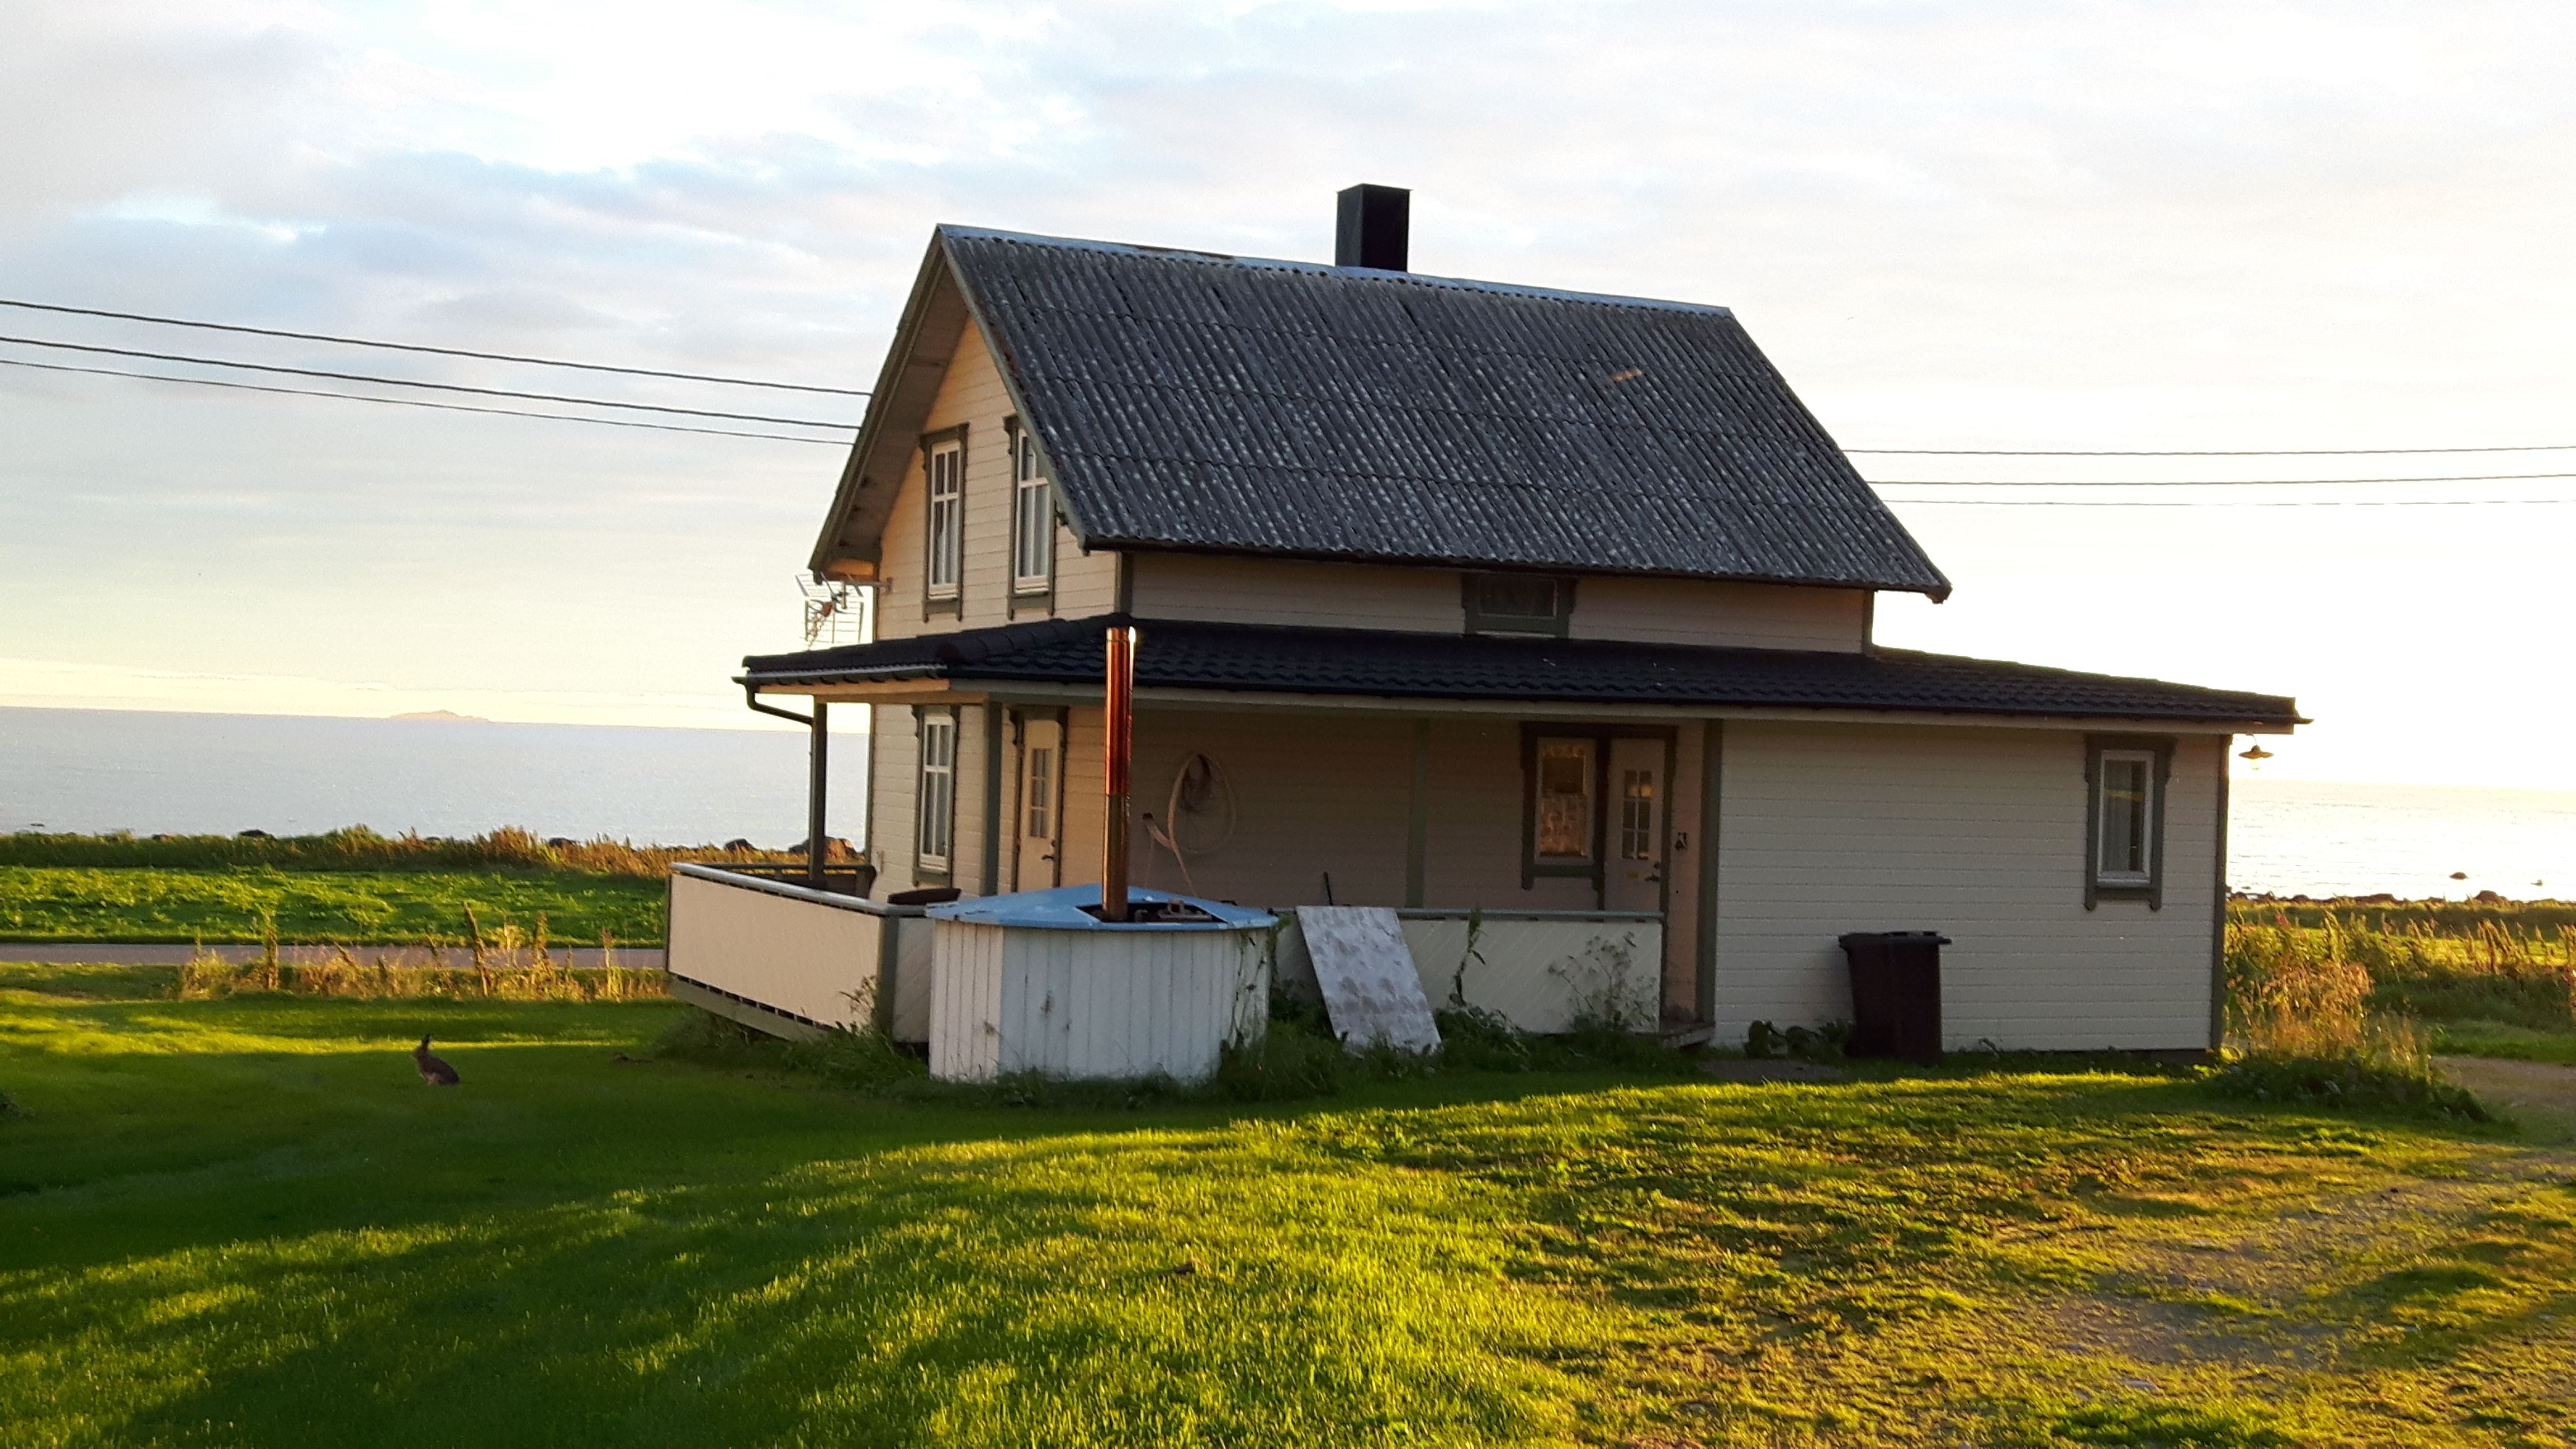 Emilhuset, Emilhuset